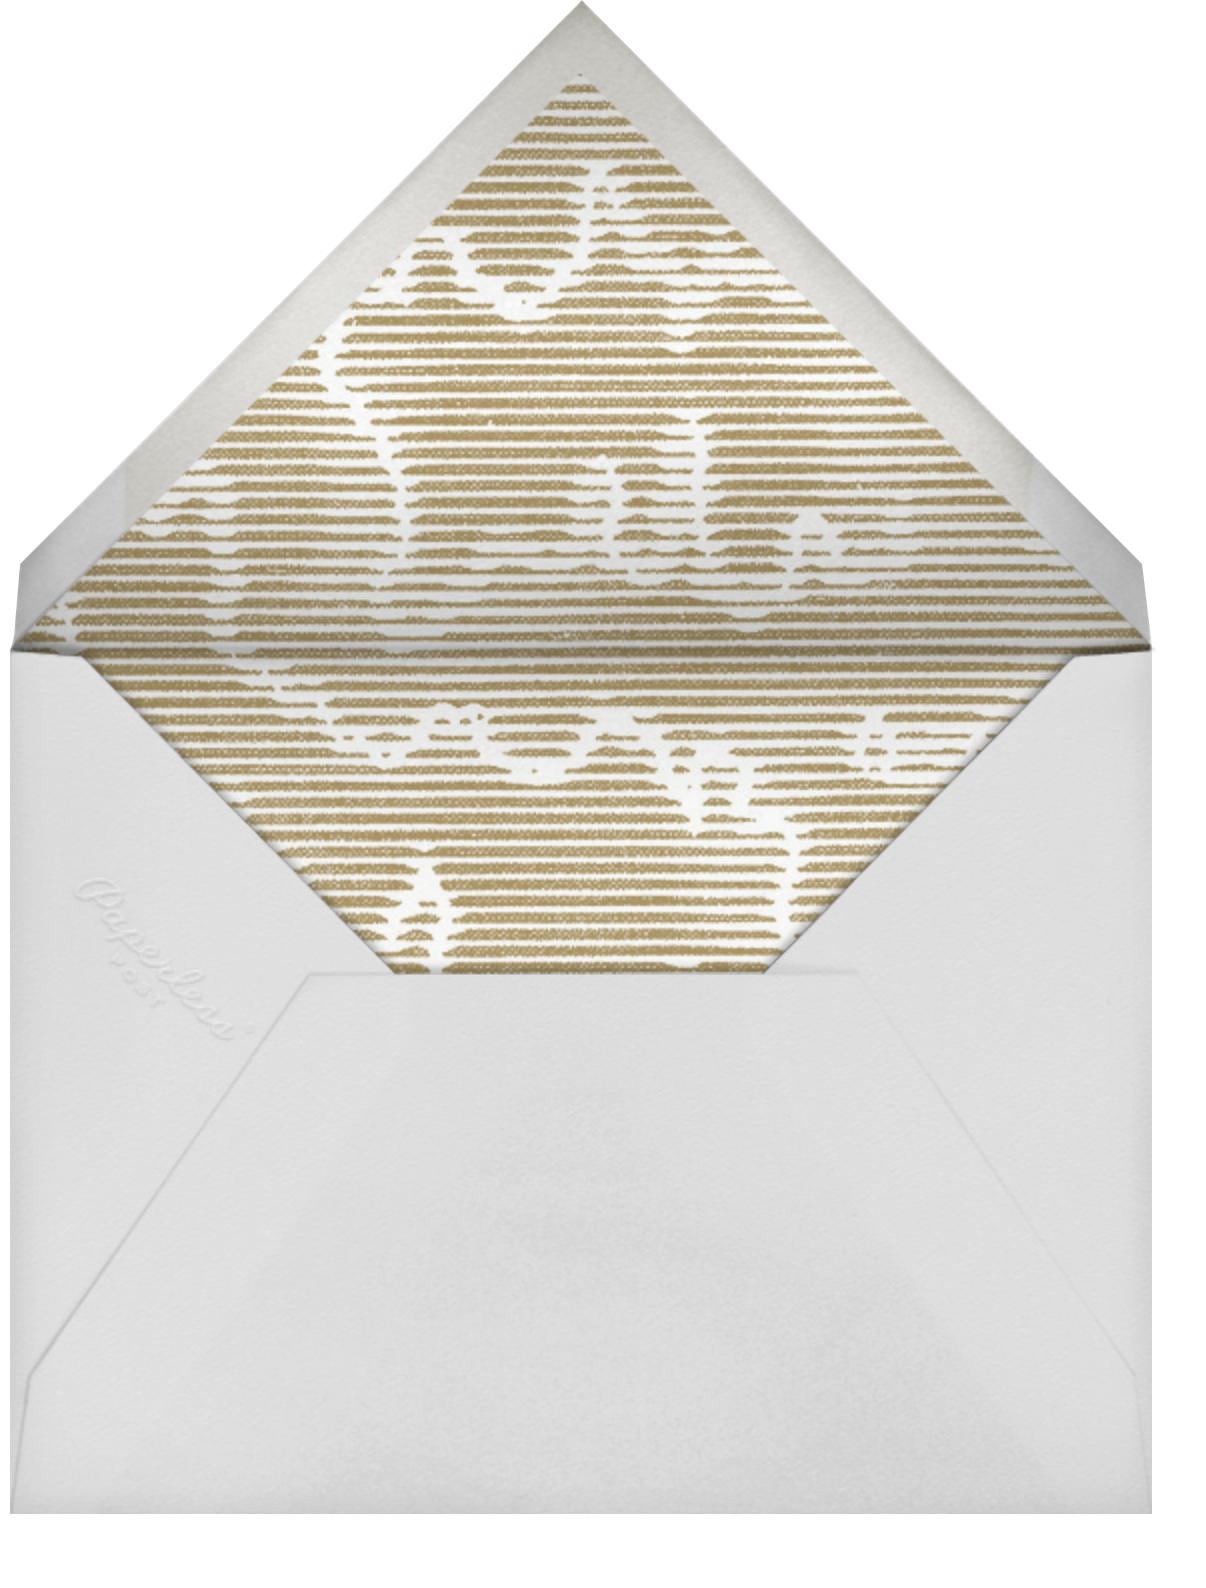 Coquette - Kelly Wearstler - Birthday - envelope back